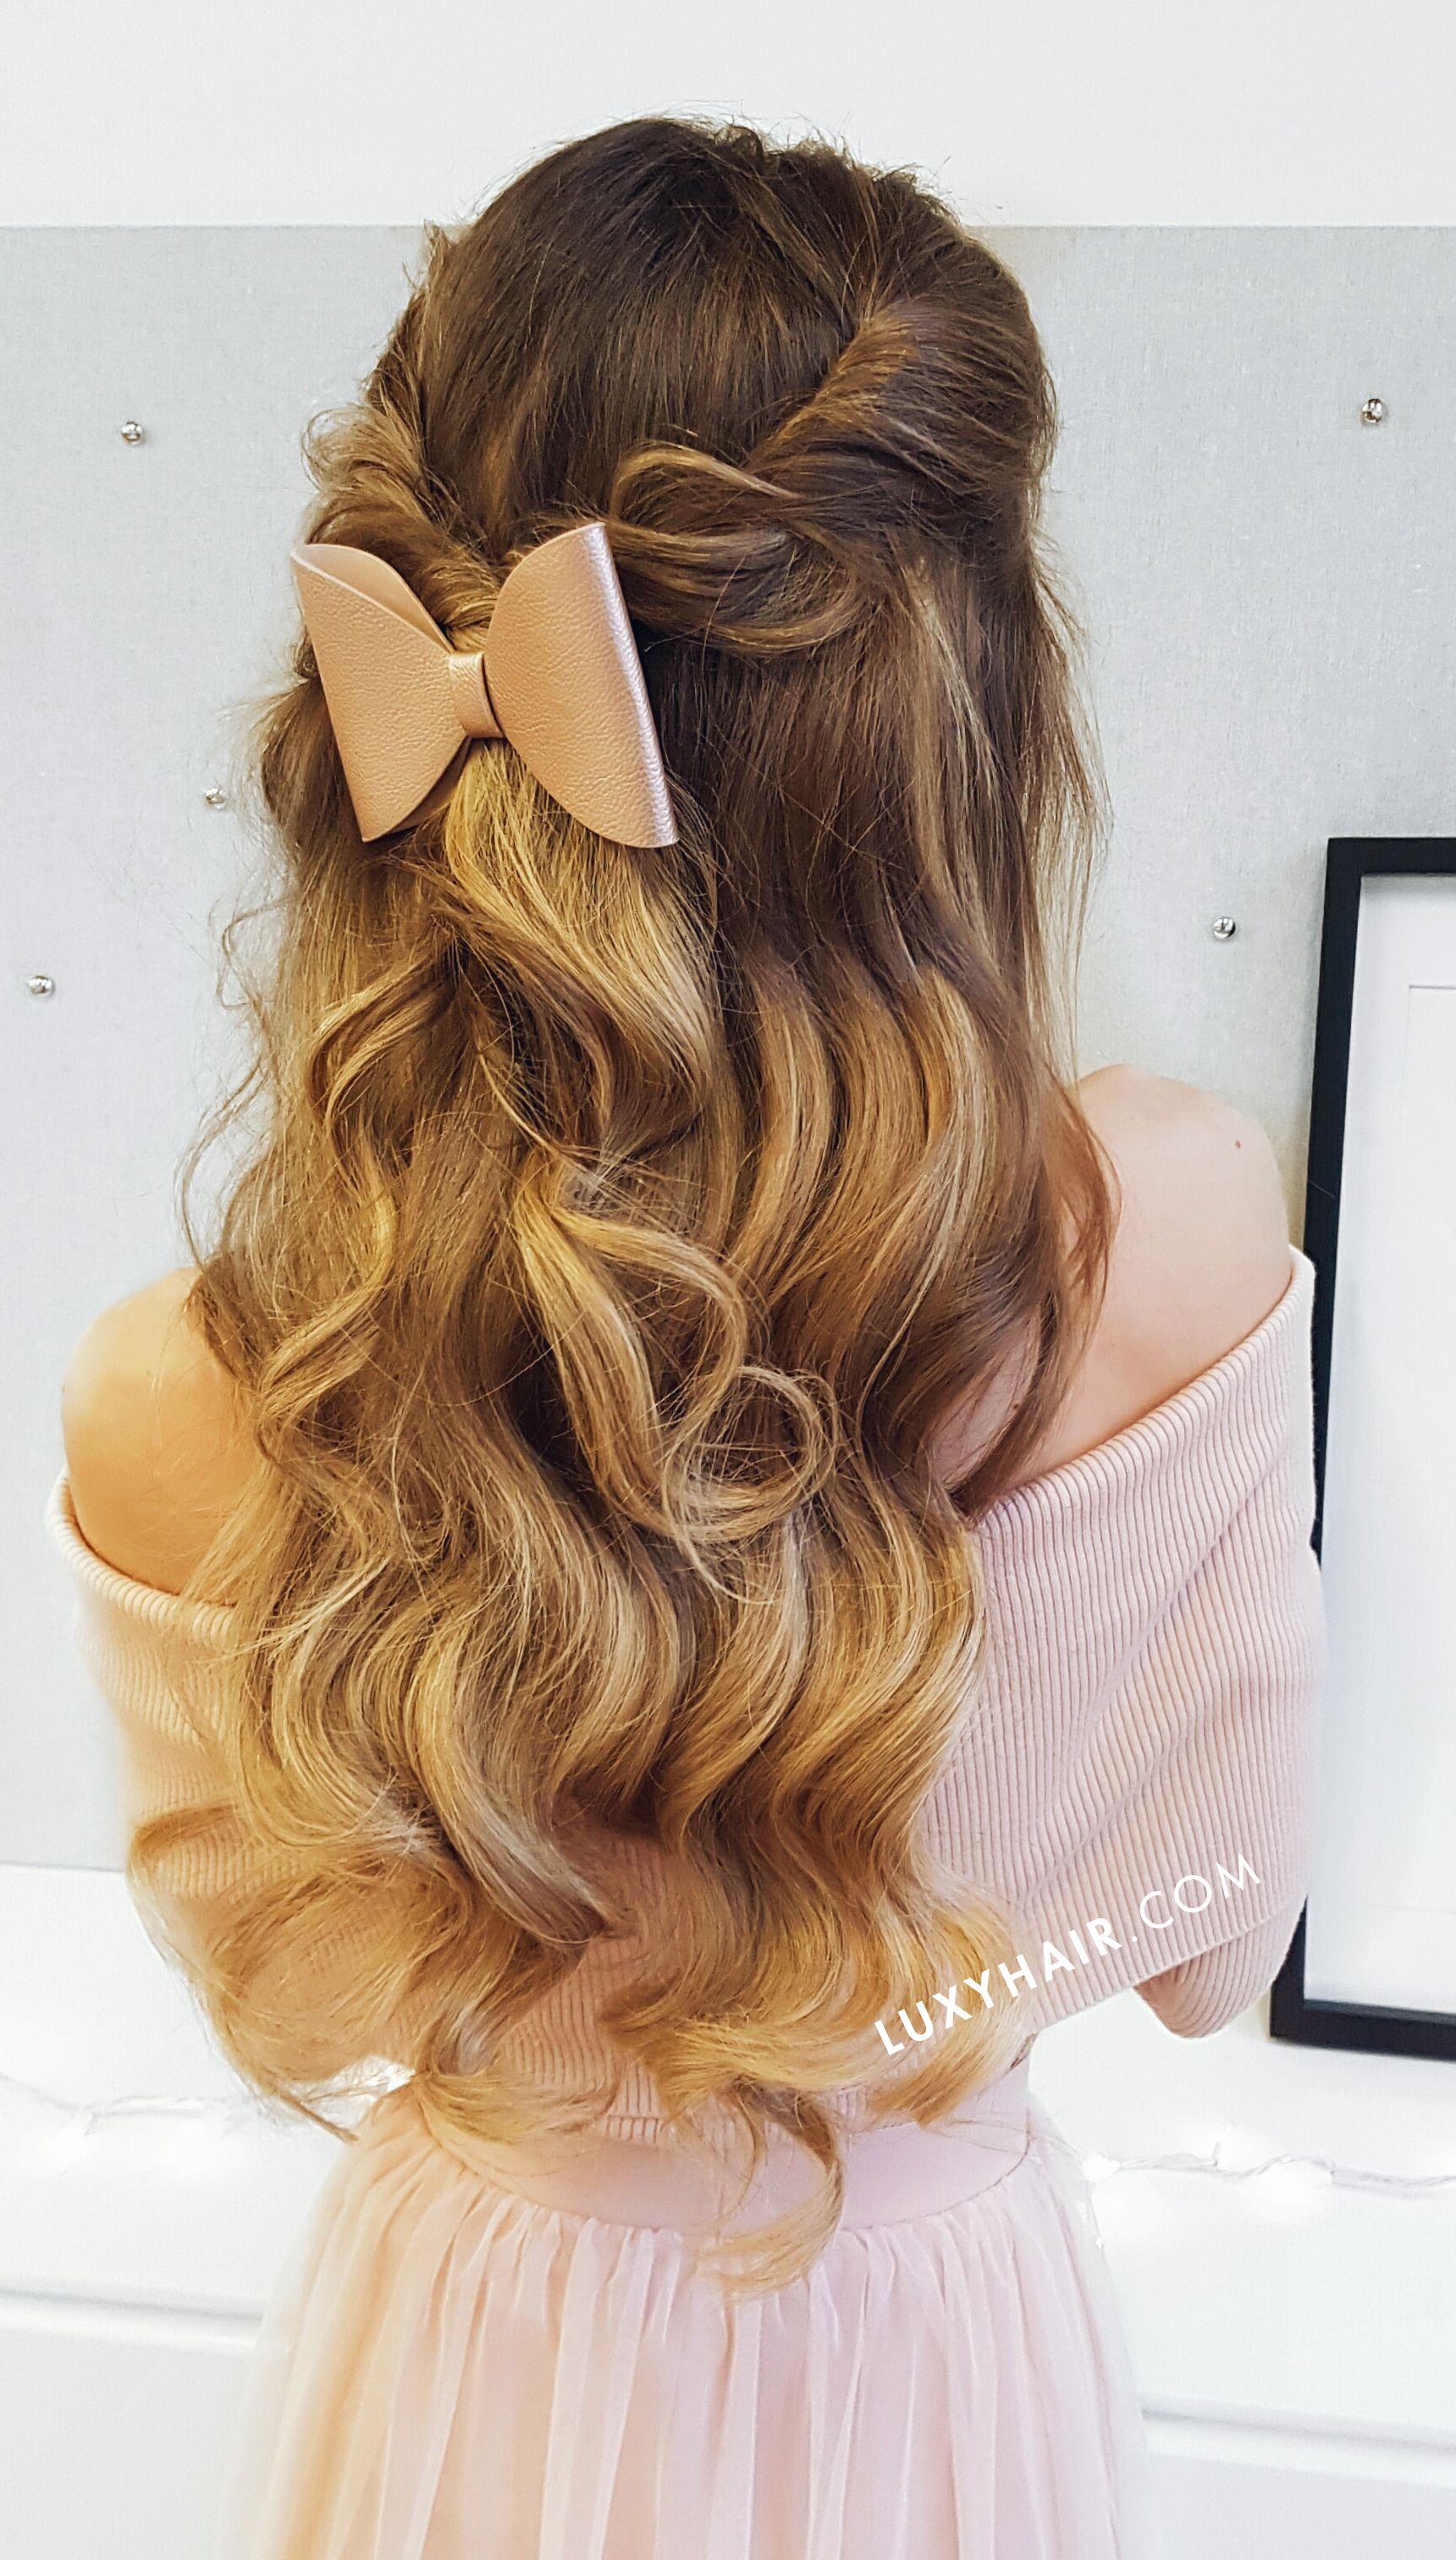 Dirty Blonde 18 20 160g Luxy Hair Extensions Pinterest